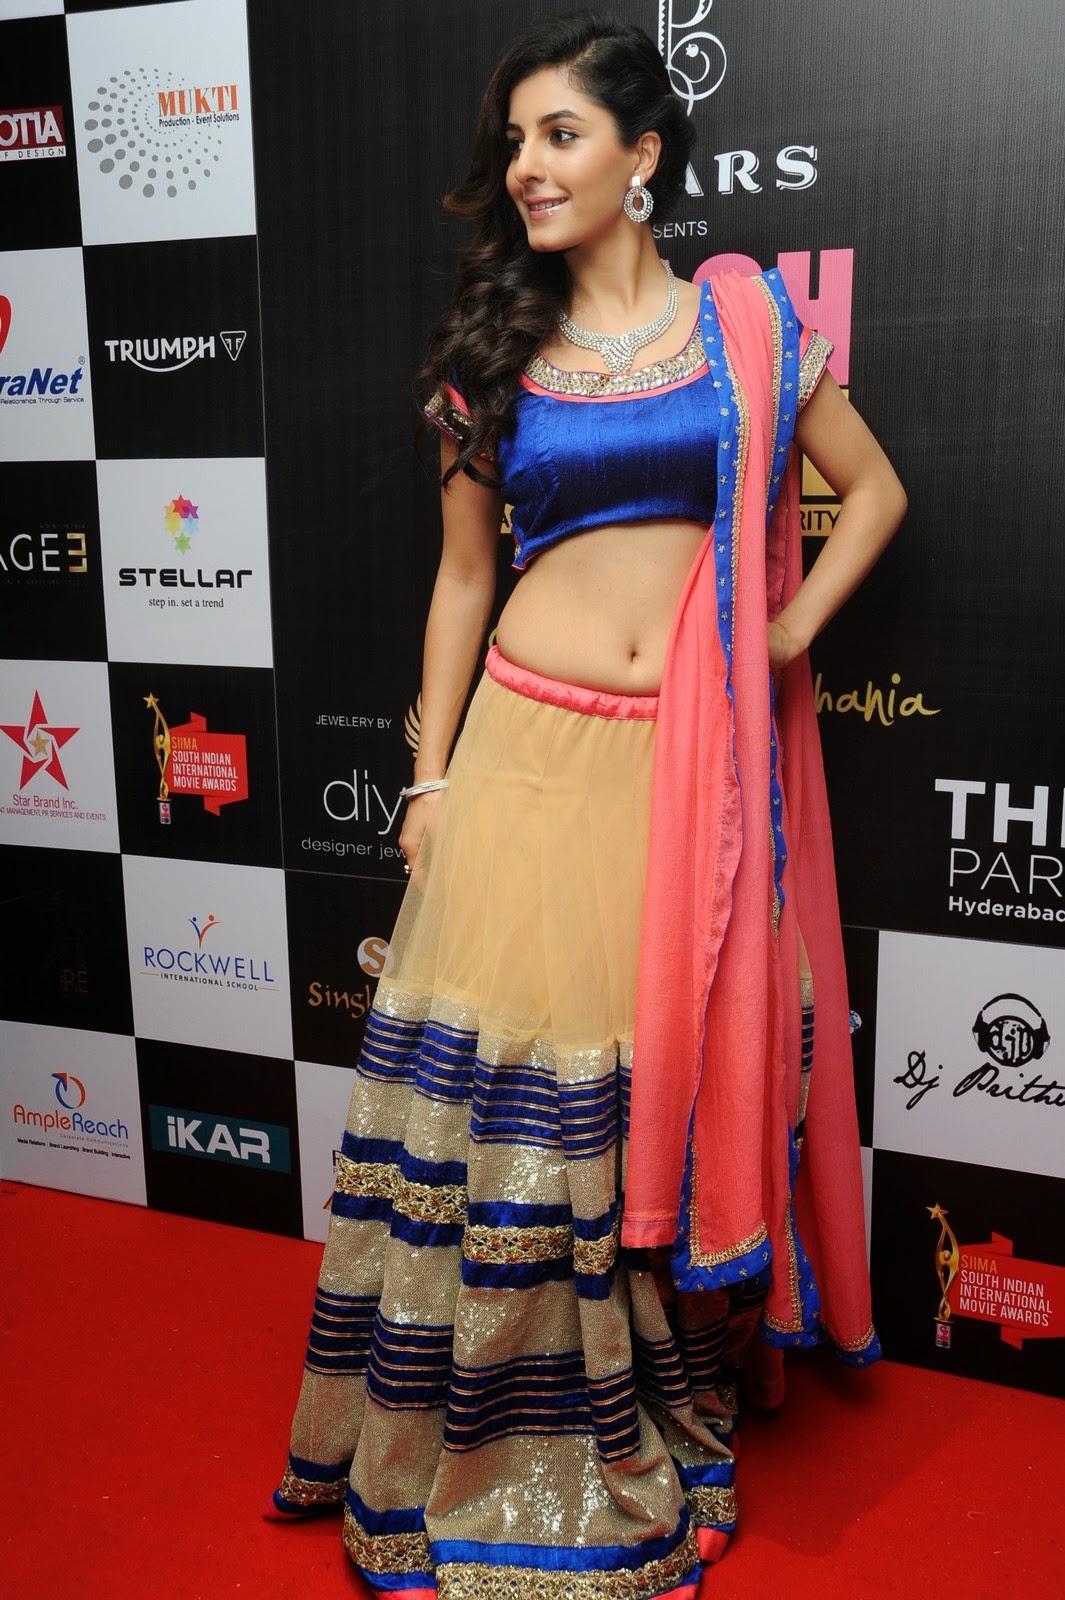 Isha talwar latest glam pics-HQ-Photo-14